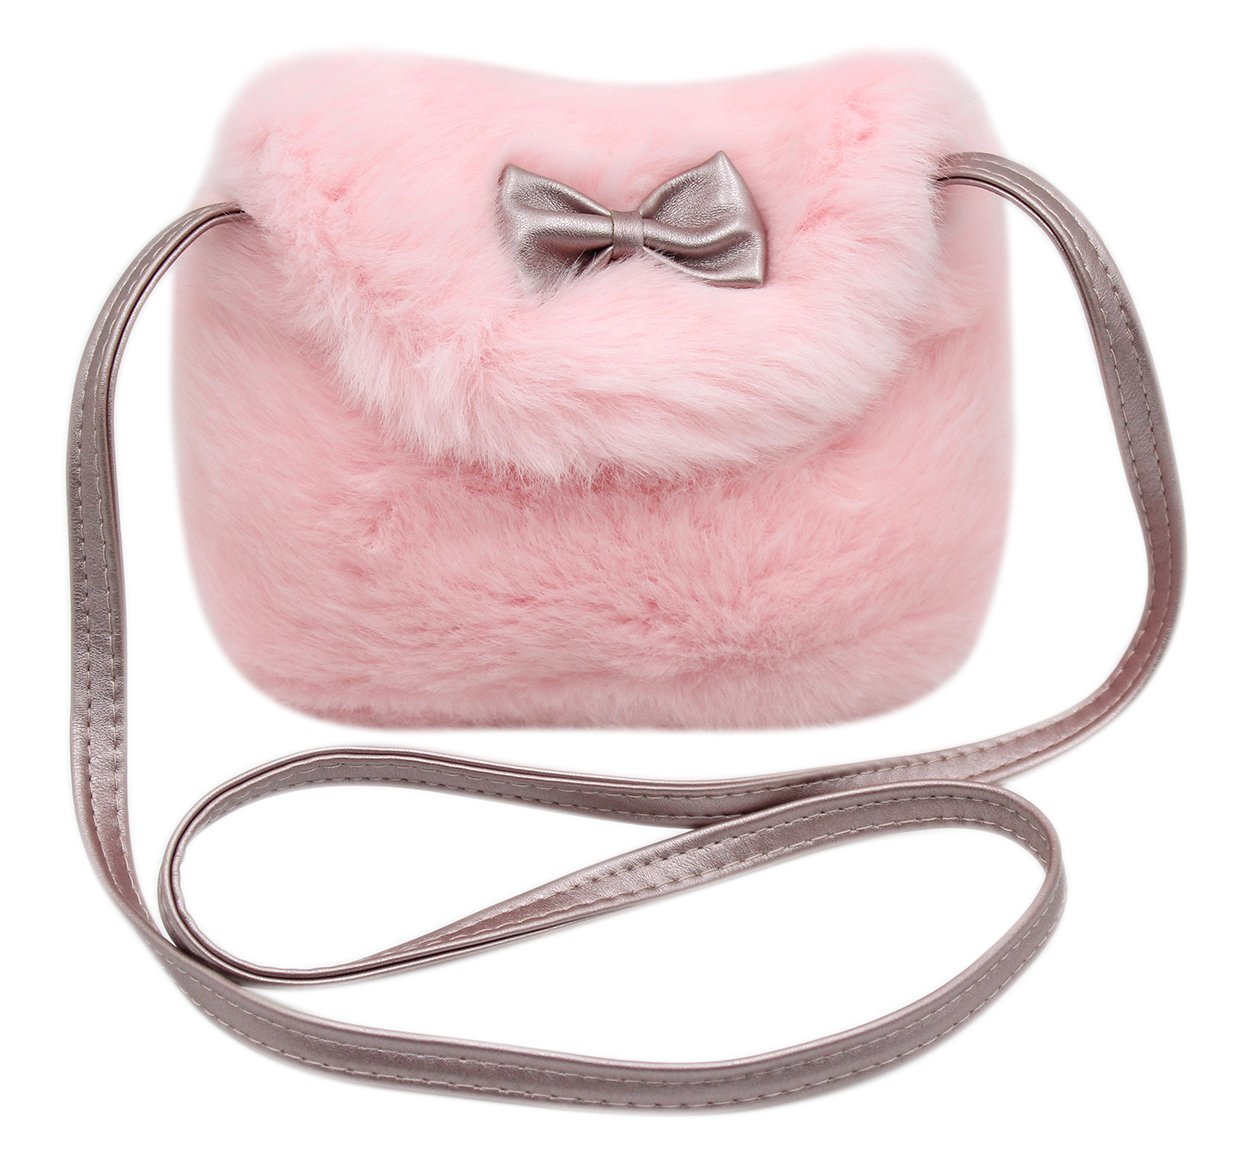 Bags us Fringe Cat Tassel Coin Purse Shoulder Bag Purse Small Crossbody Satchel handbags for Kids Girls